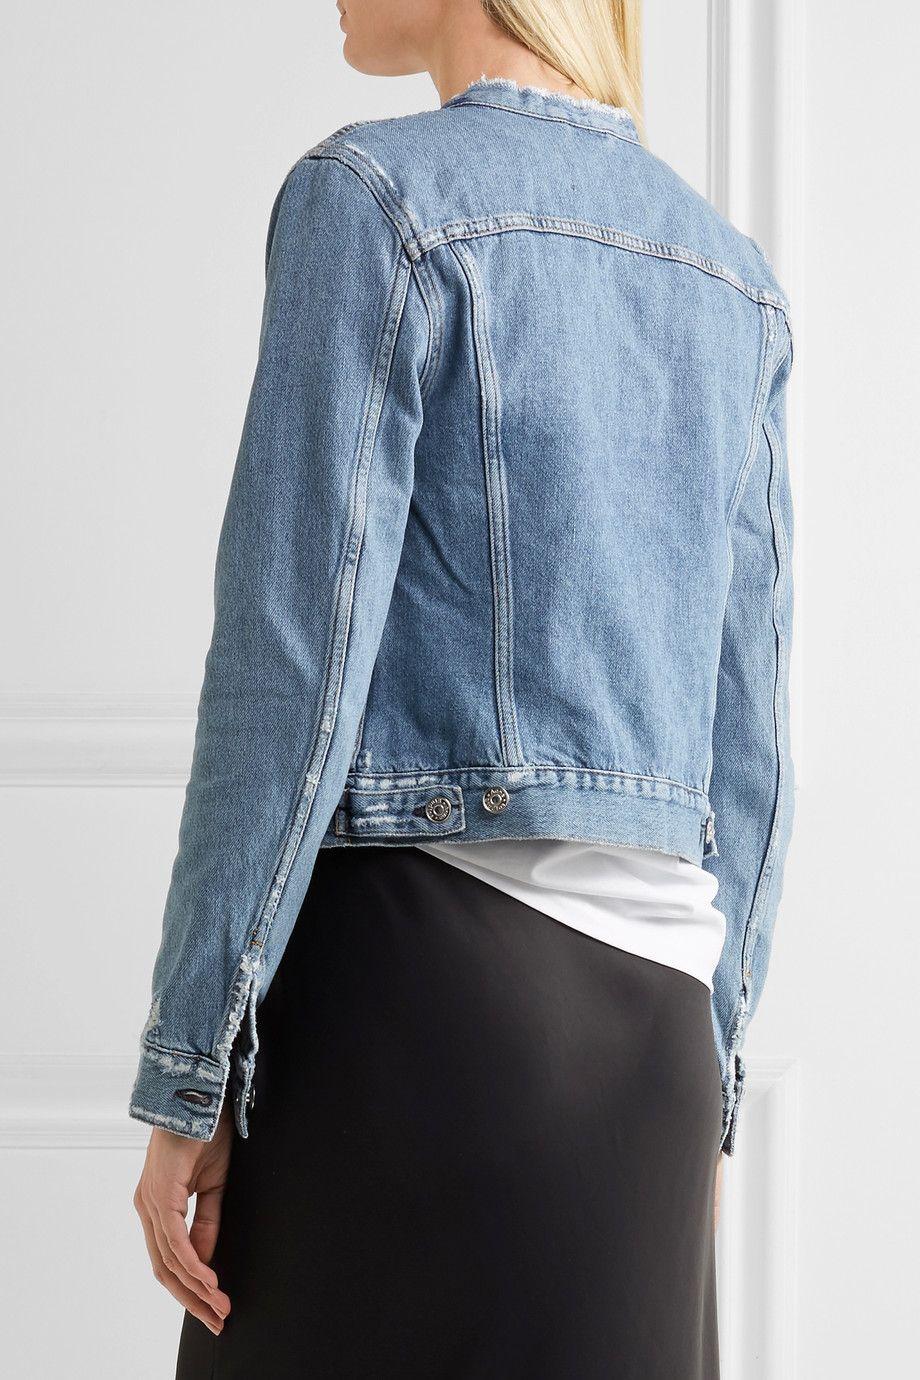 Acne Studios - Veste en jean effet vieilli. Light-blue denim Button  fastenings through front 100% cotton Dry clean Made in Italy 6c03a25b047